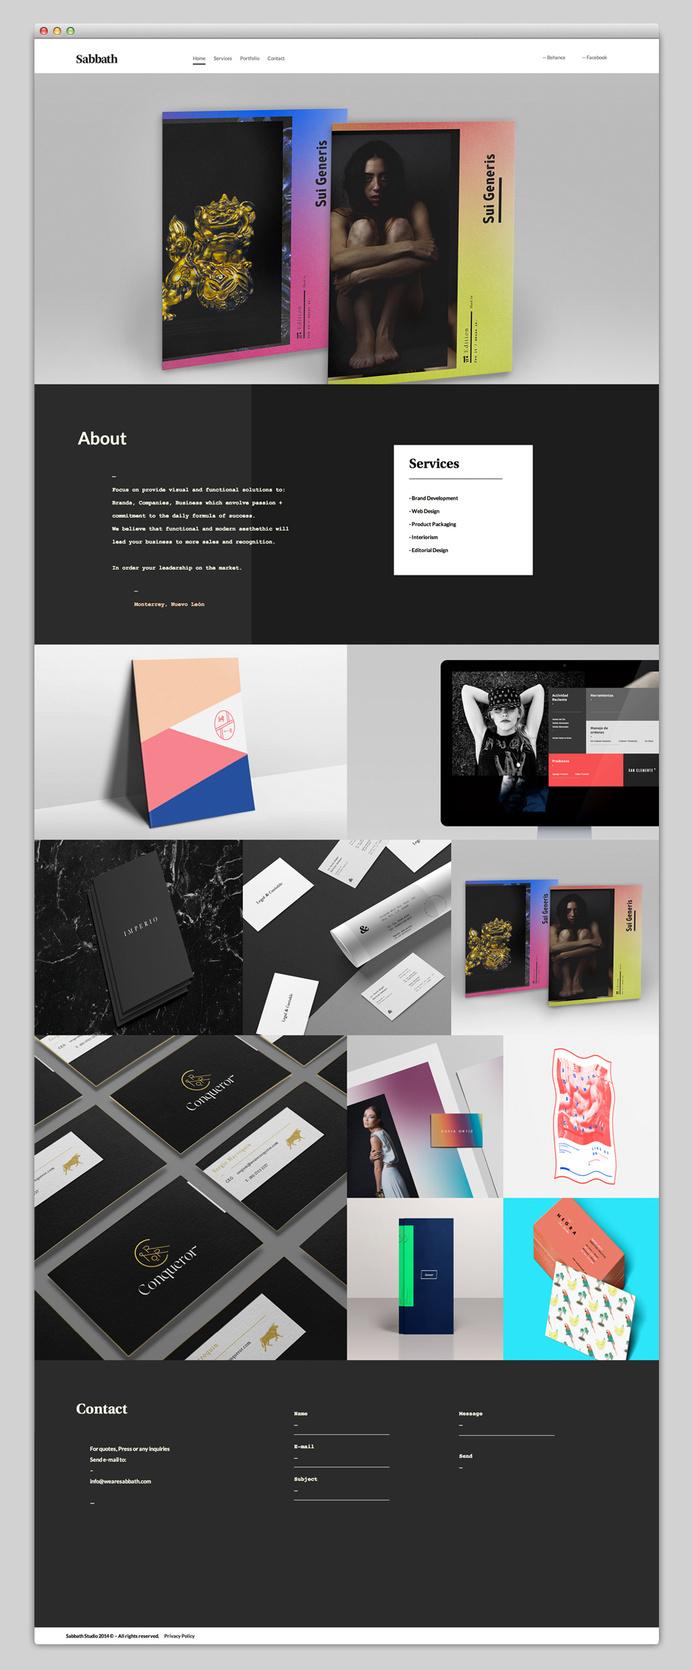 Websites We Love — Showcasing The Best in Web Design #agency #modern #design #best #website #ui #minimal #webdesign #web #typography